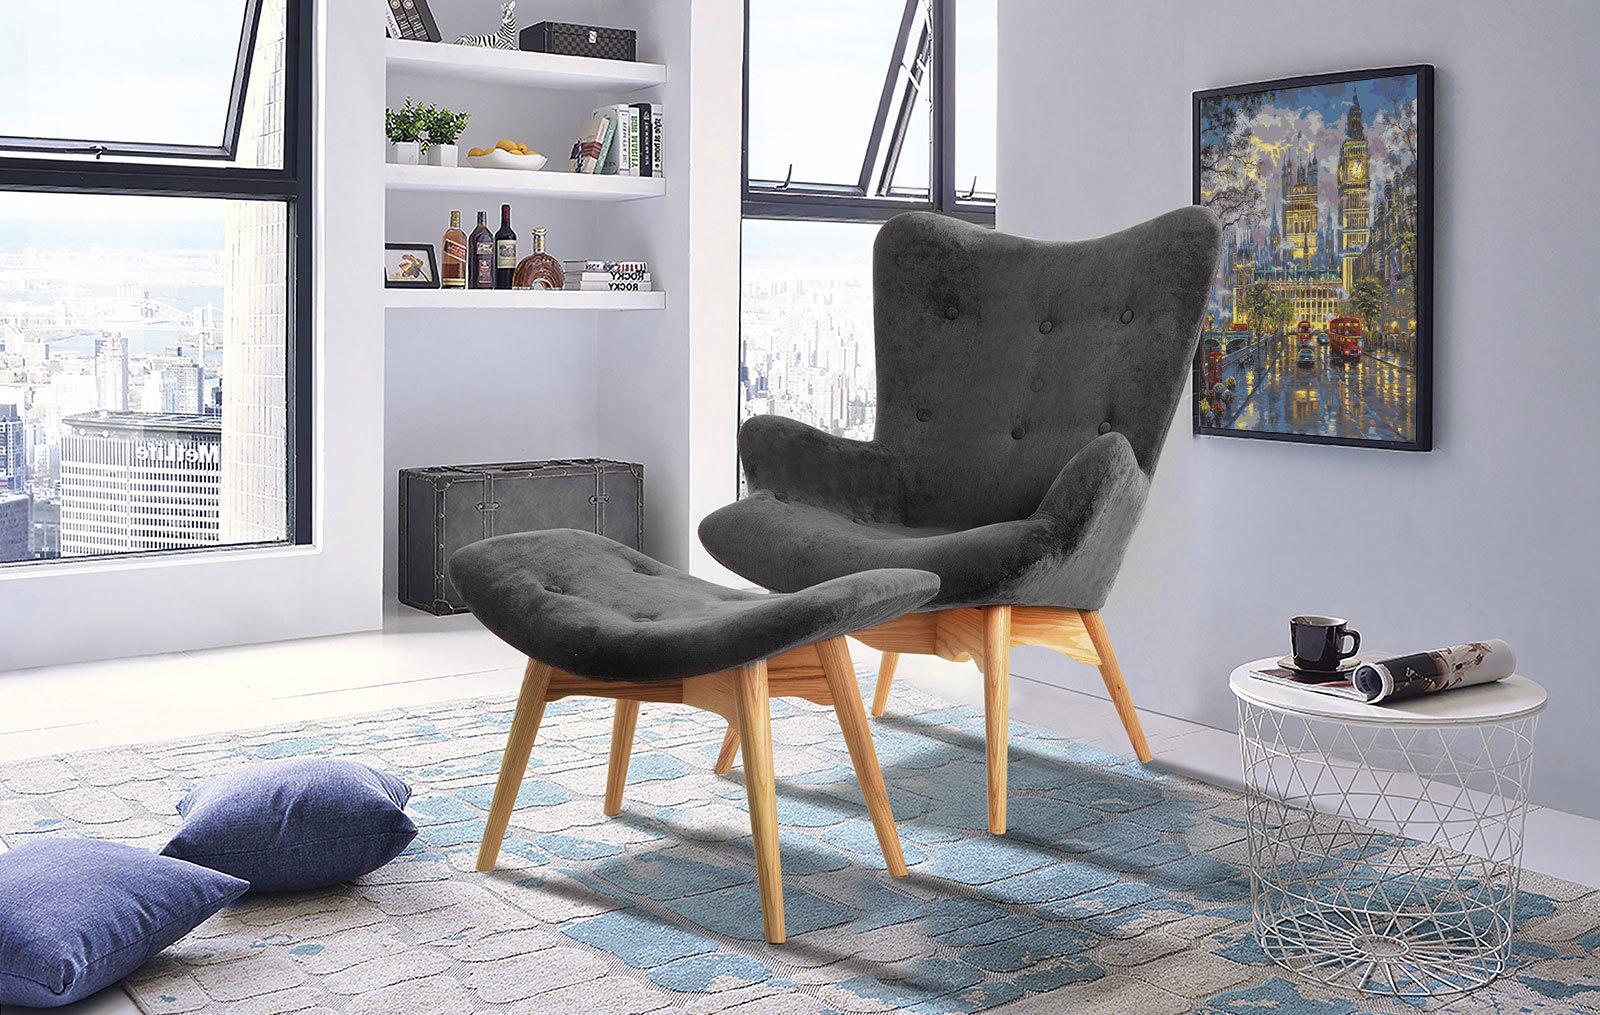 Кресло DC917 графит HE492-10 + банкетка DC917F графит